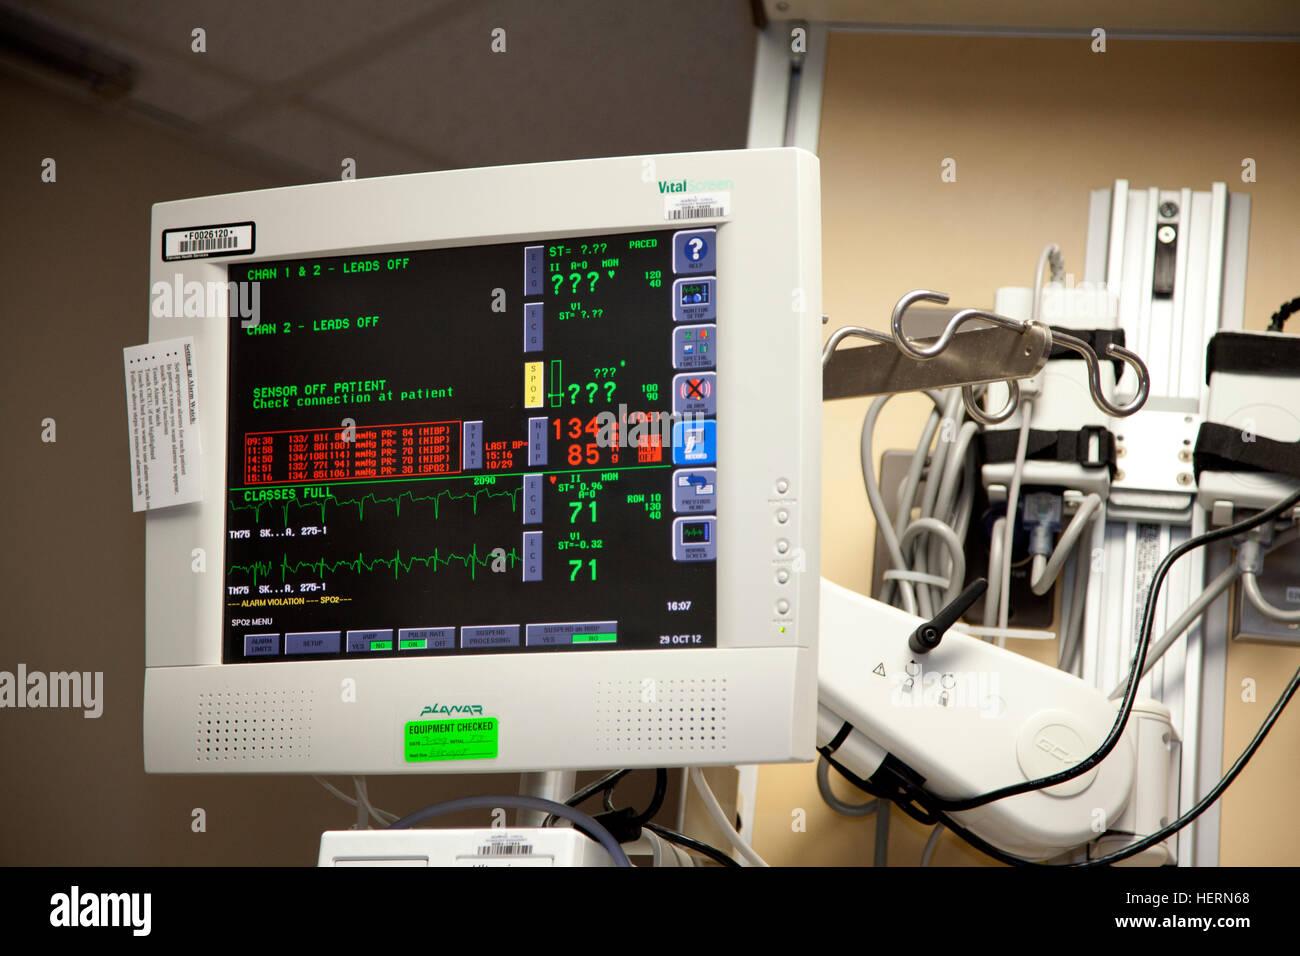 Hospital screen for visually monitoring patient vital signs. Minneapolis Minnesota MN USA - Stock Image